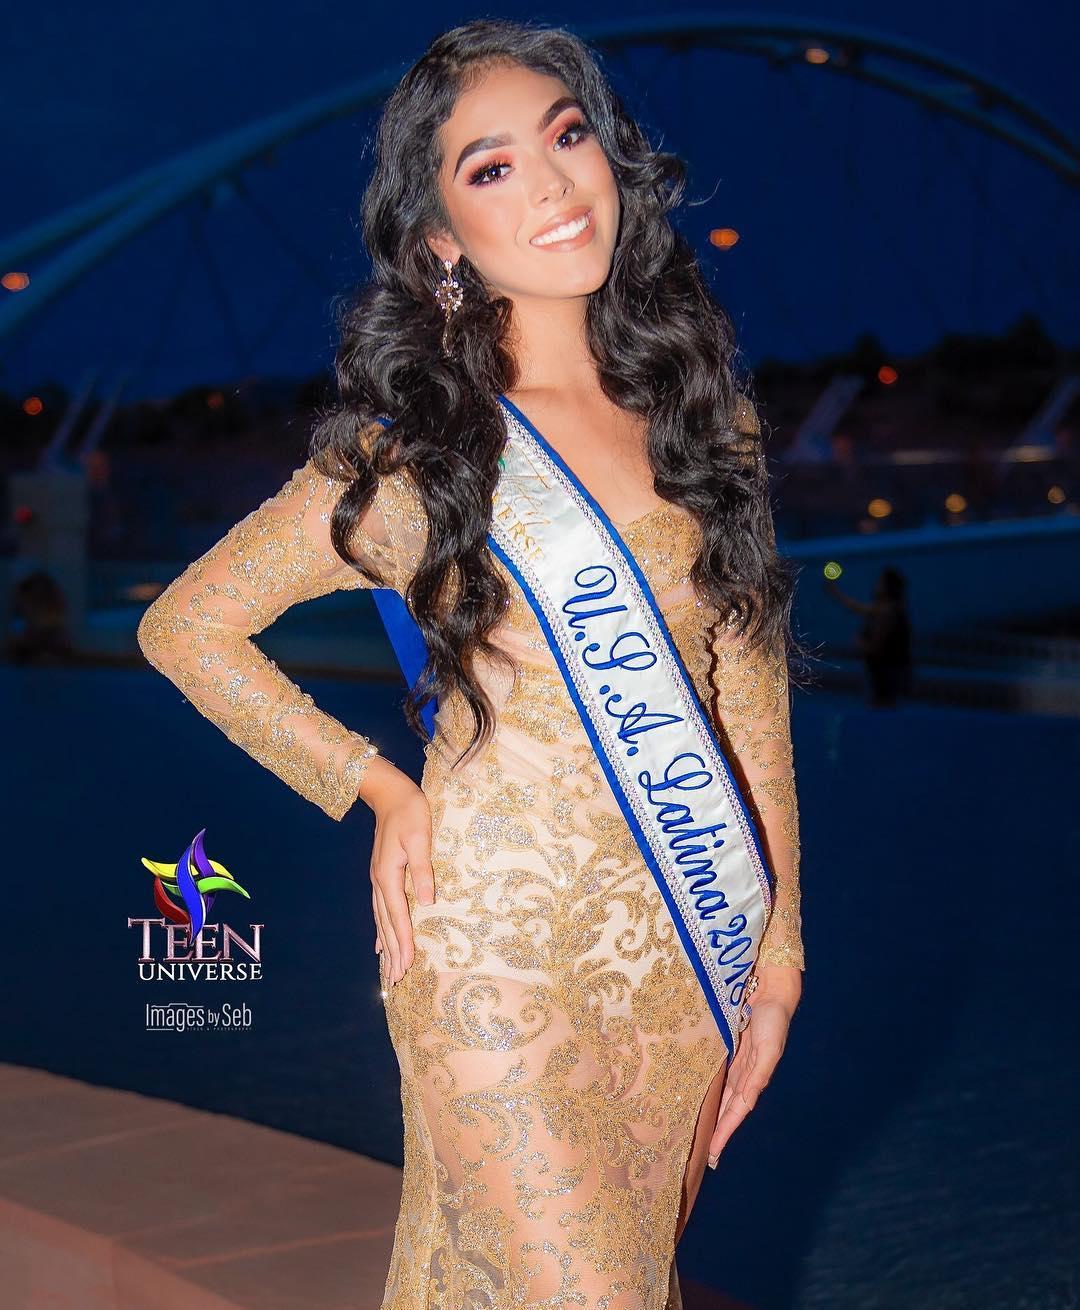 kristian de leon, miss teen mundial usa 2019/top 16 de teen universe 2018. - Página 3 37665210